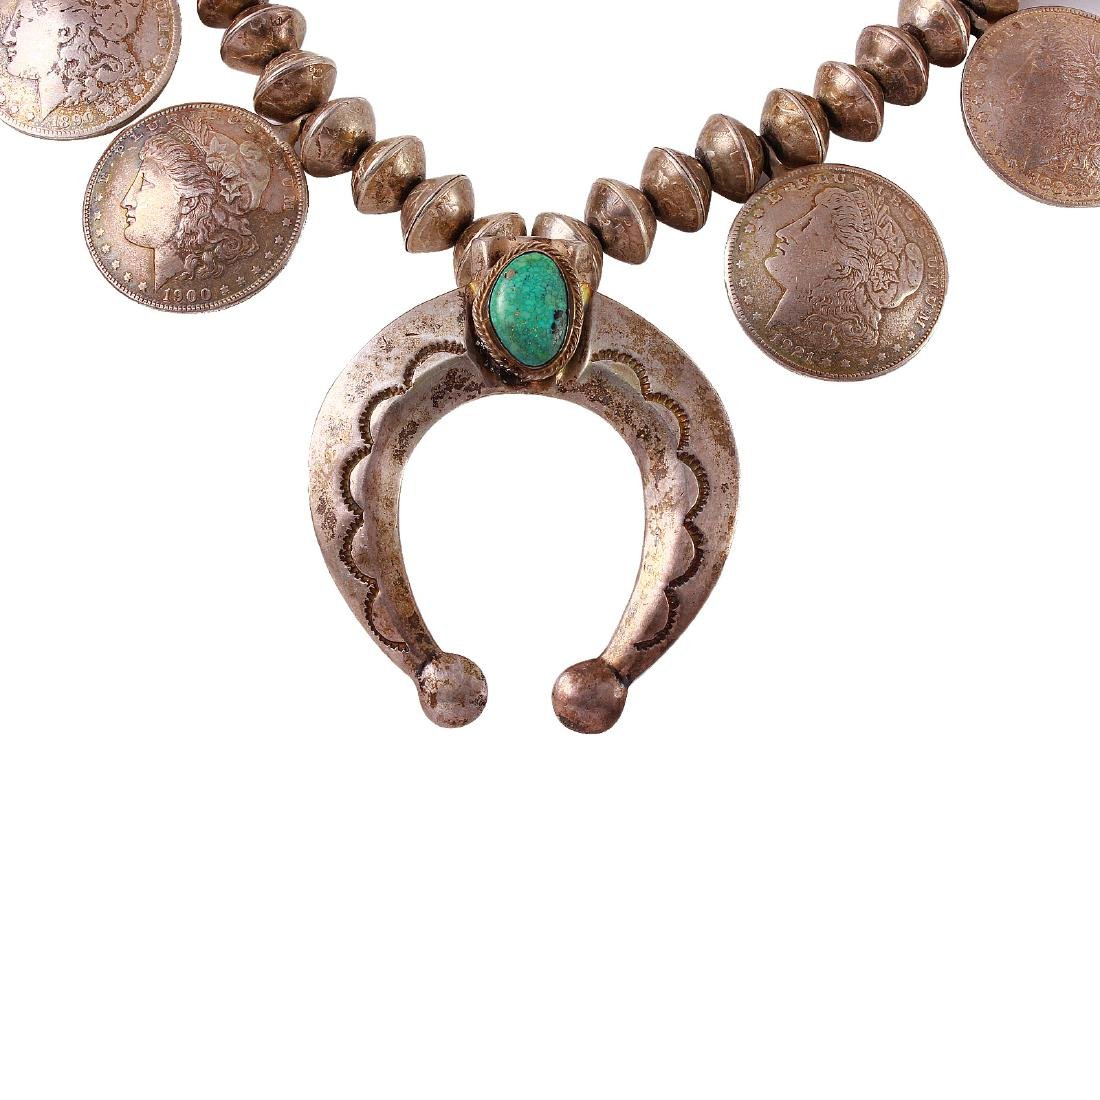 Handmade Coin Silver Navajo Necklace